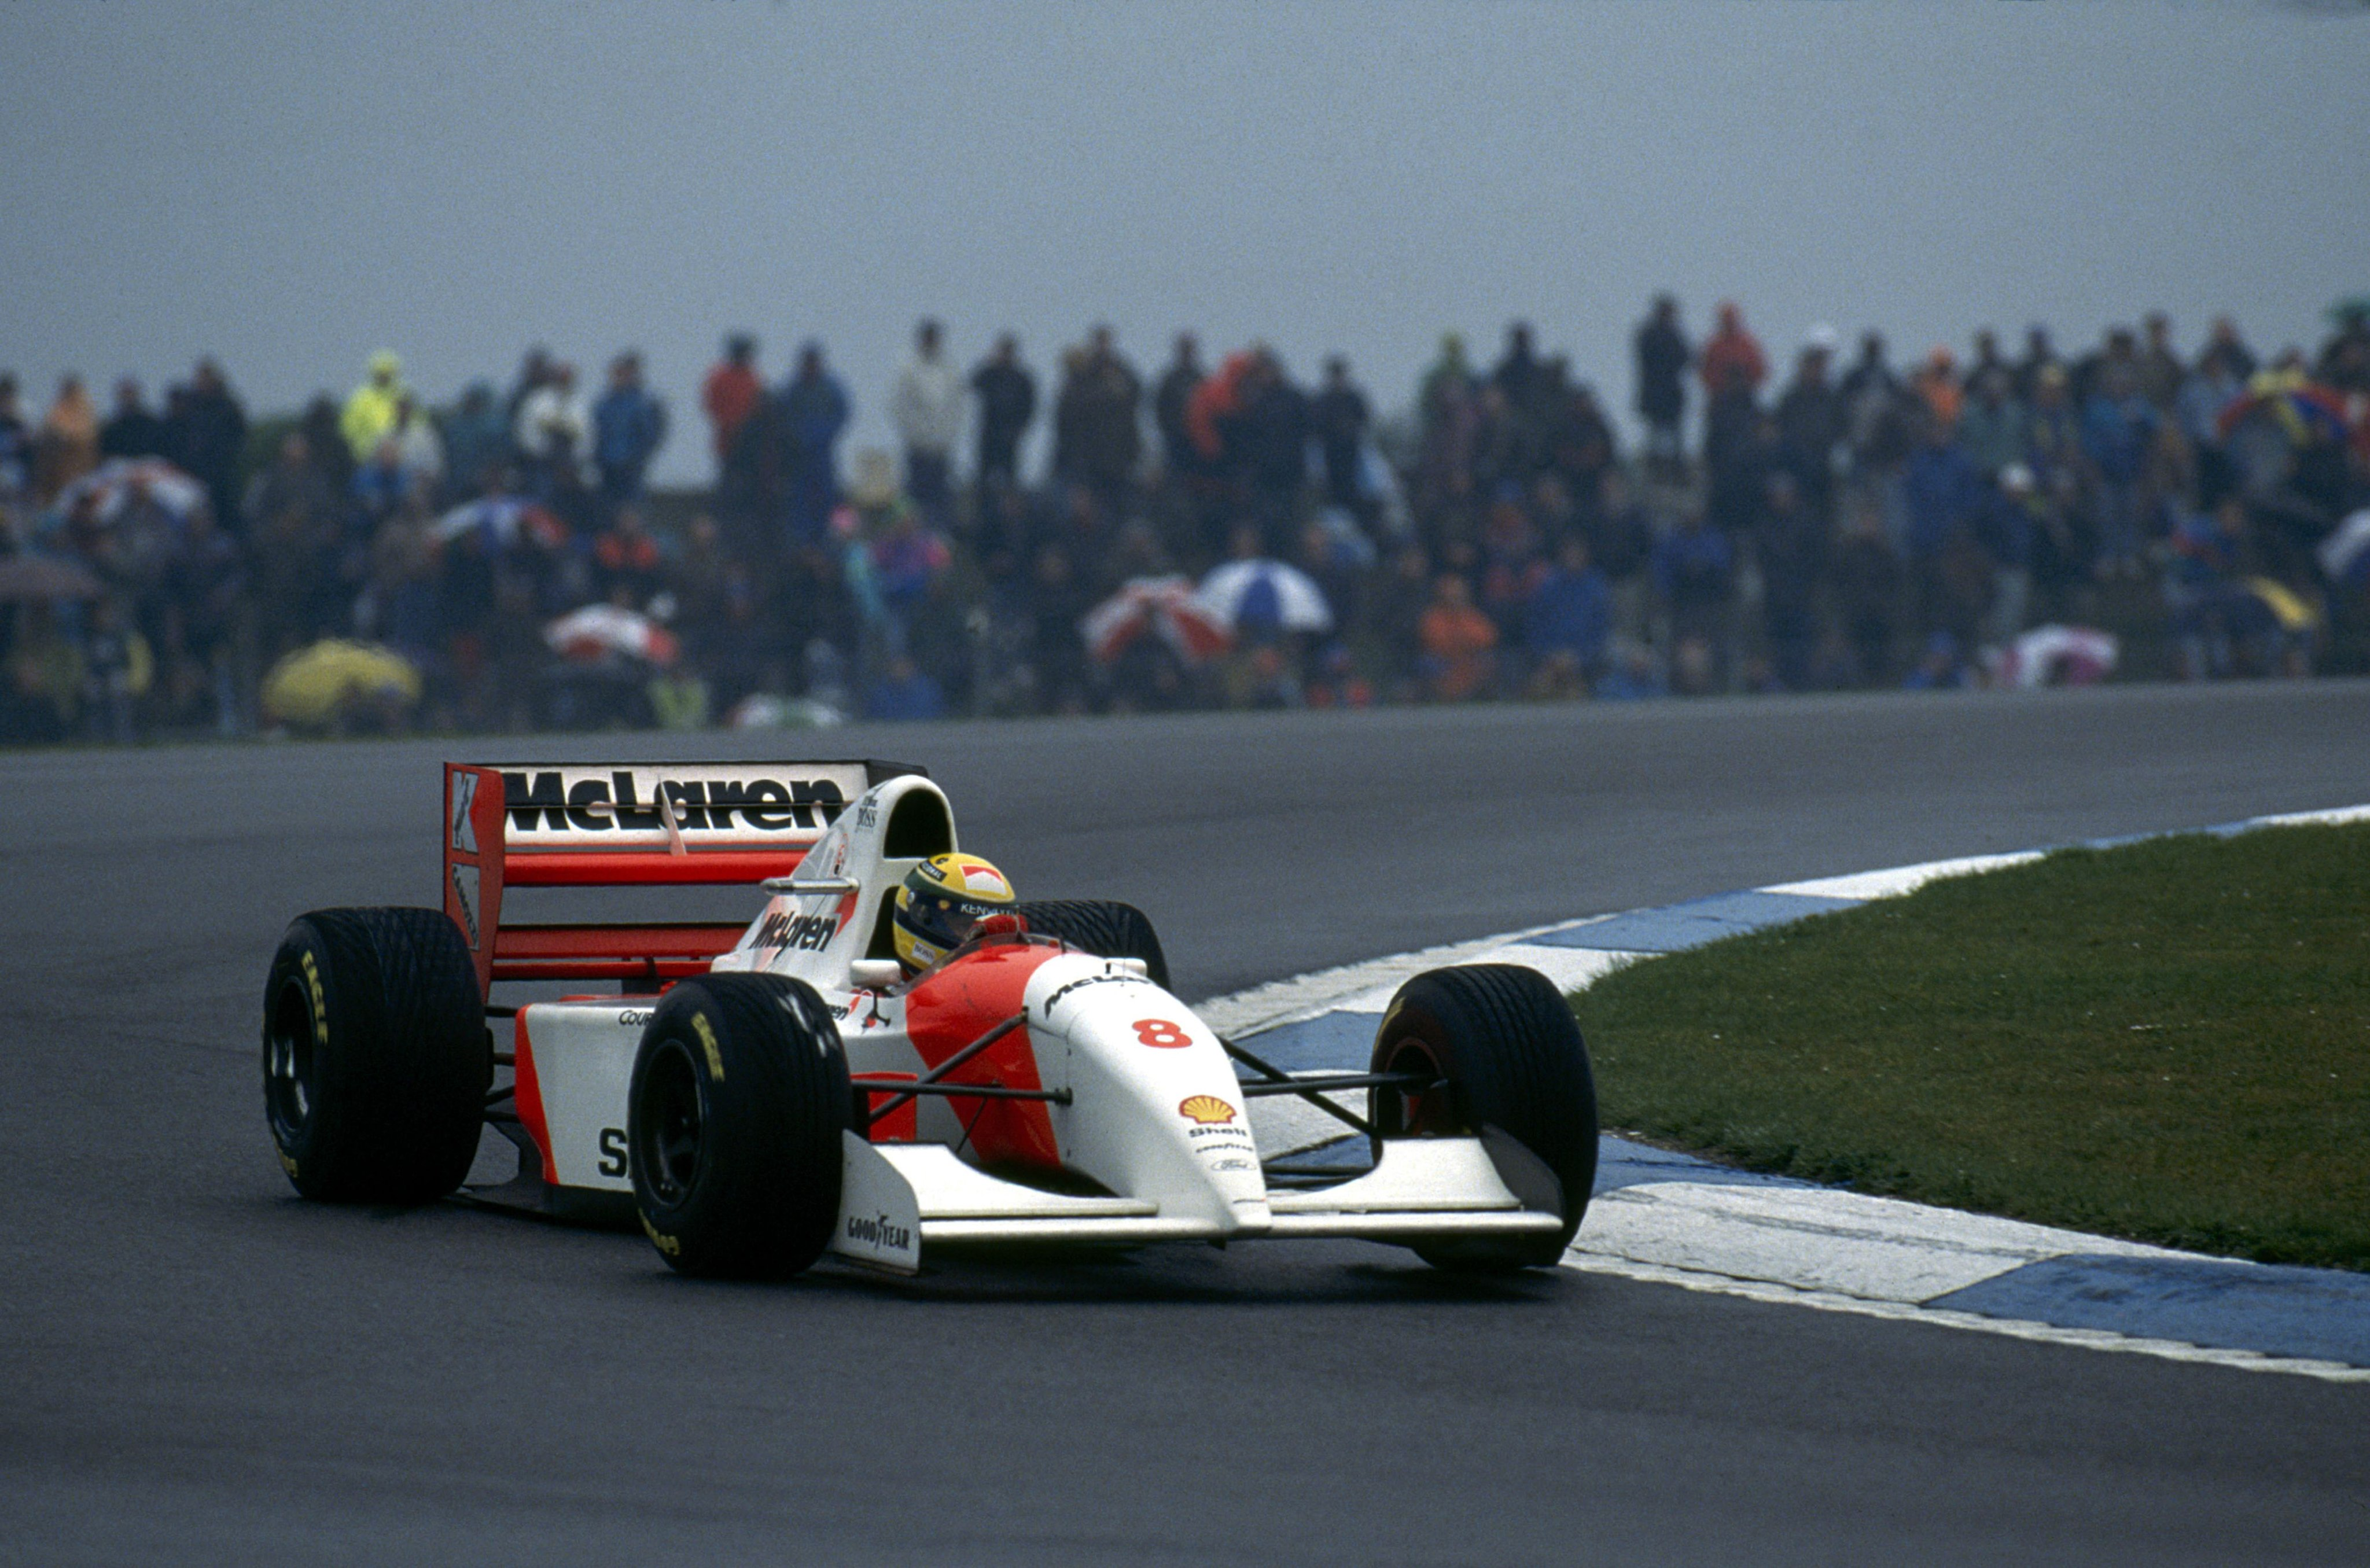 1993 Mclaren Ford Mp4 8 F 1 Race Racing Formula Wallpaper